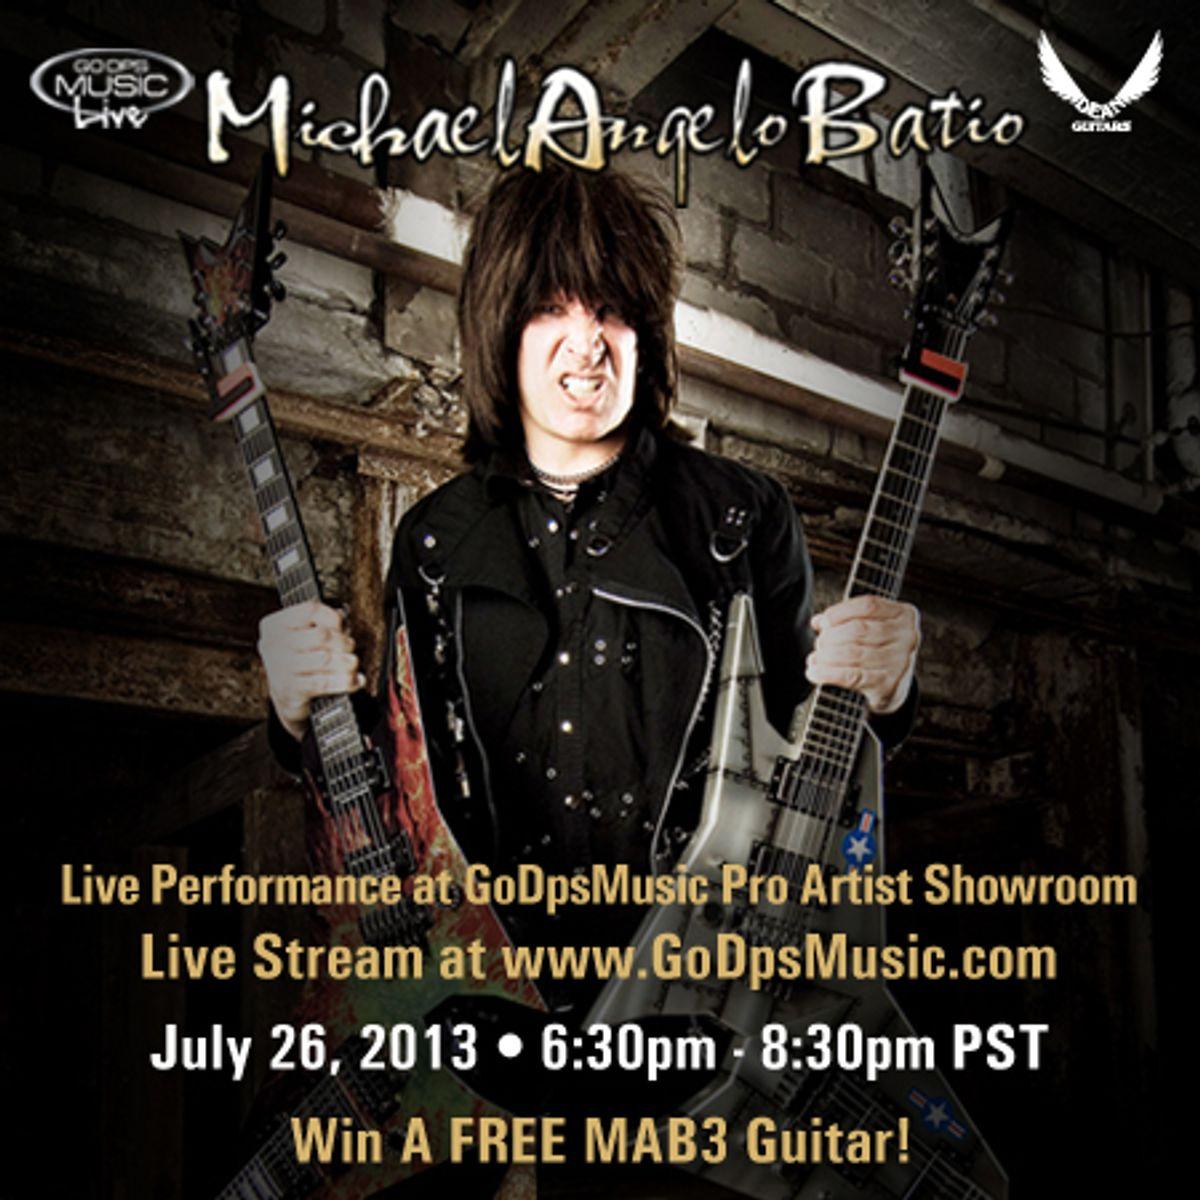 Michael Angelo Batio to Broadcast Live Guitar Clinic Tonight